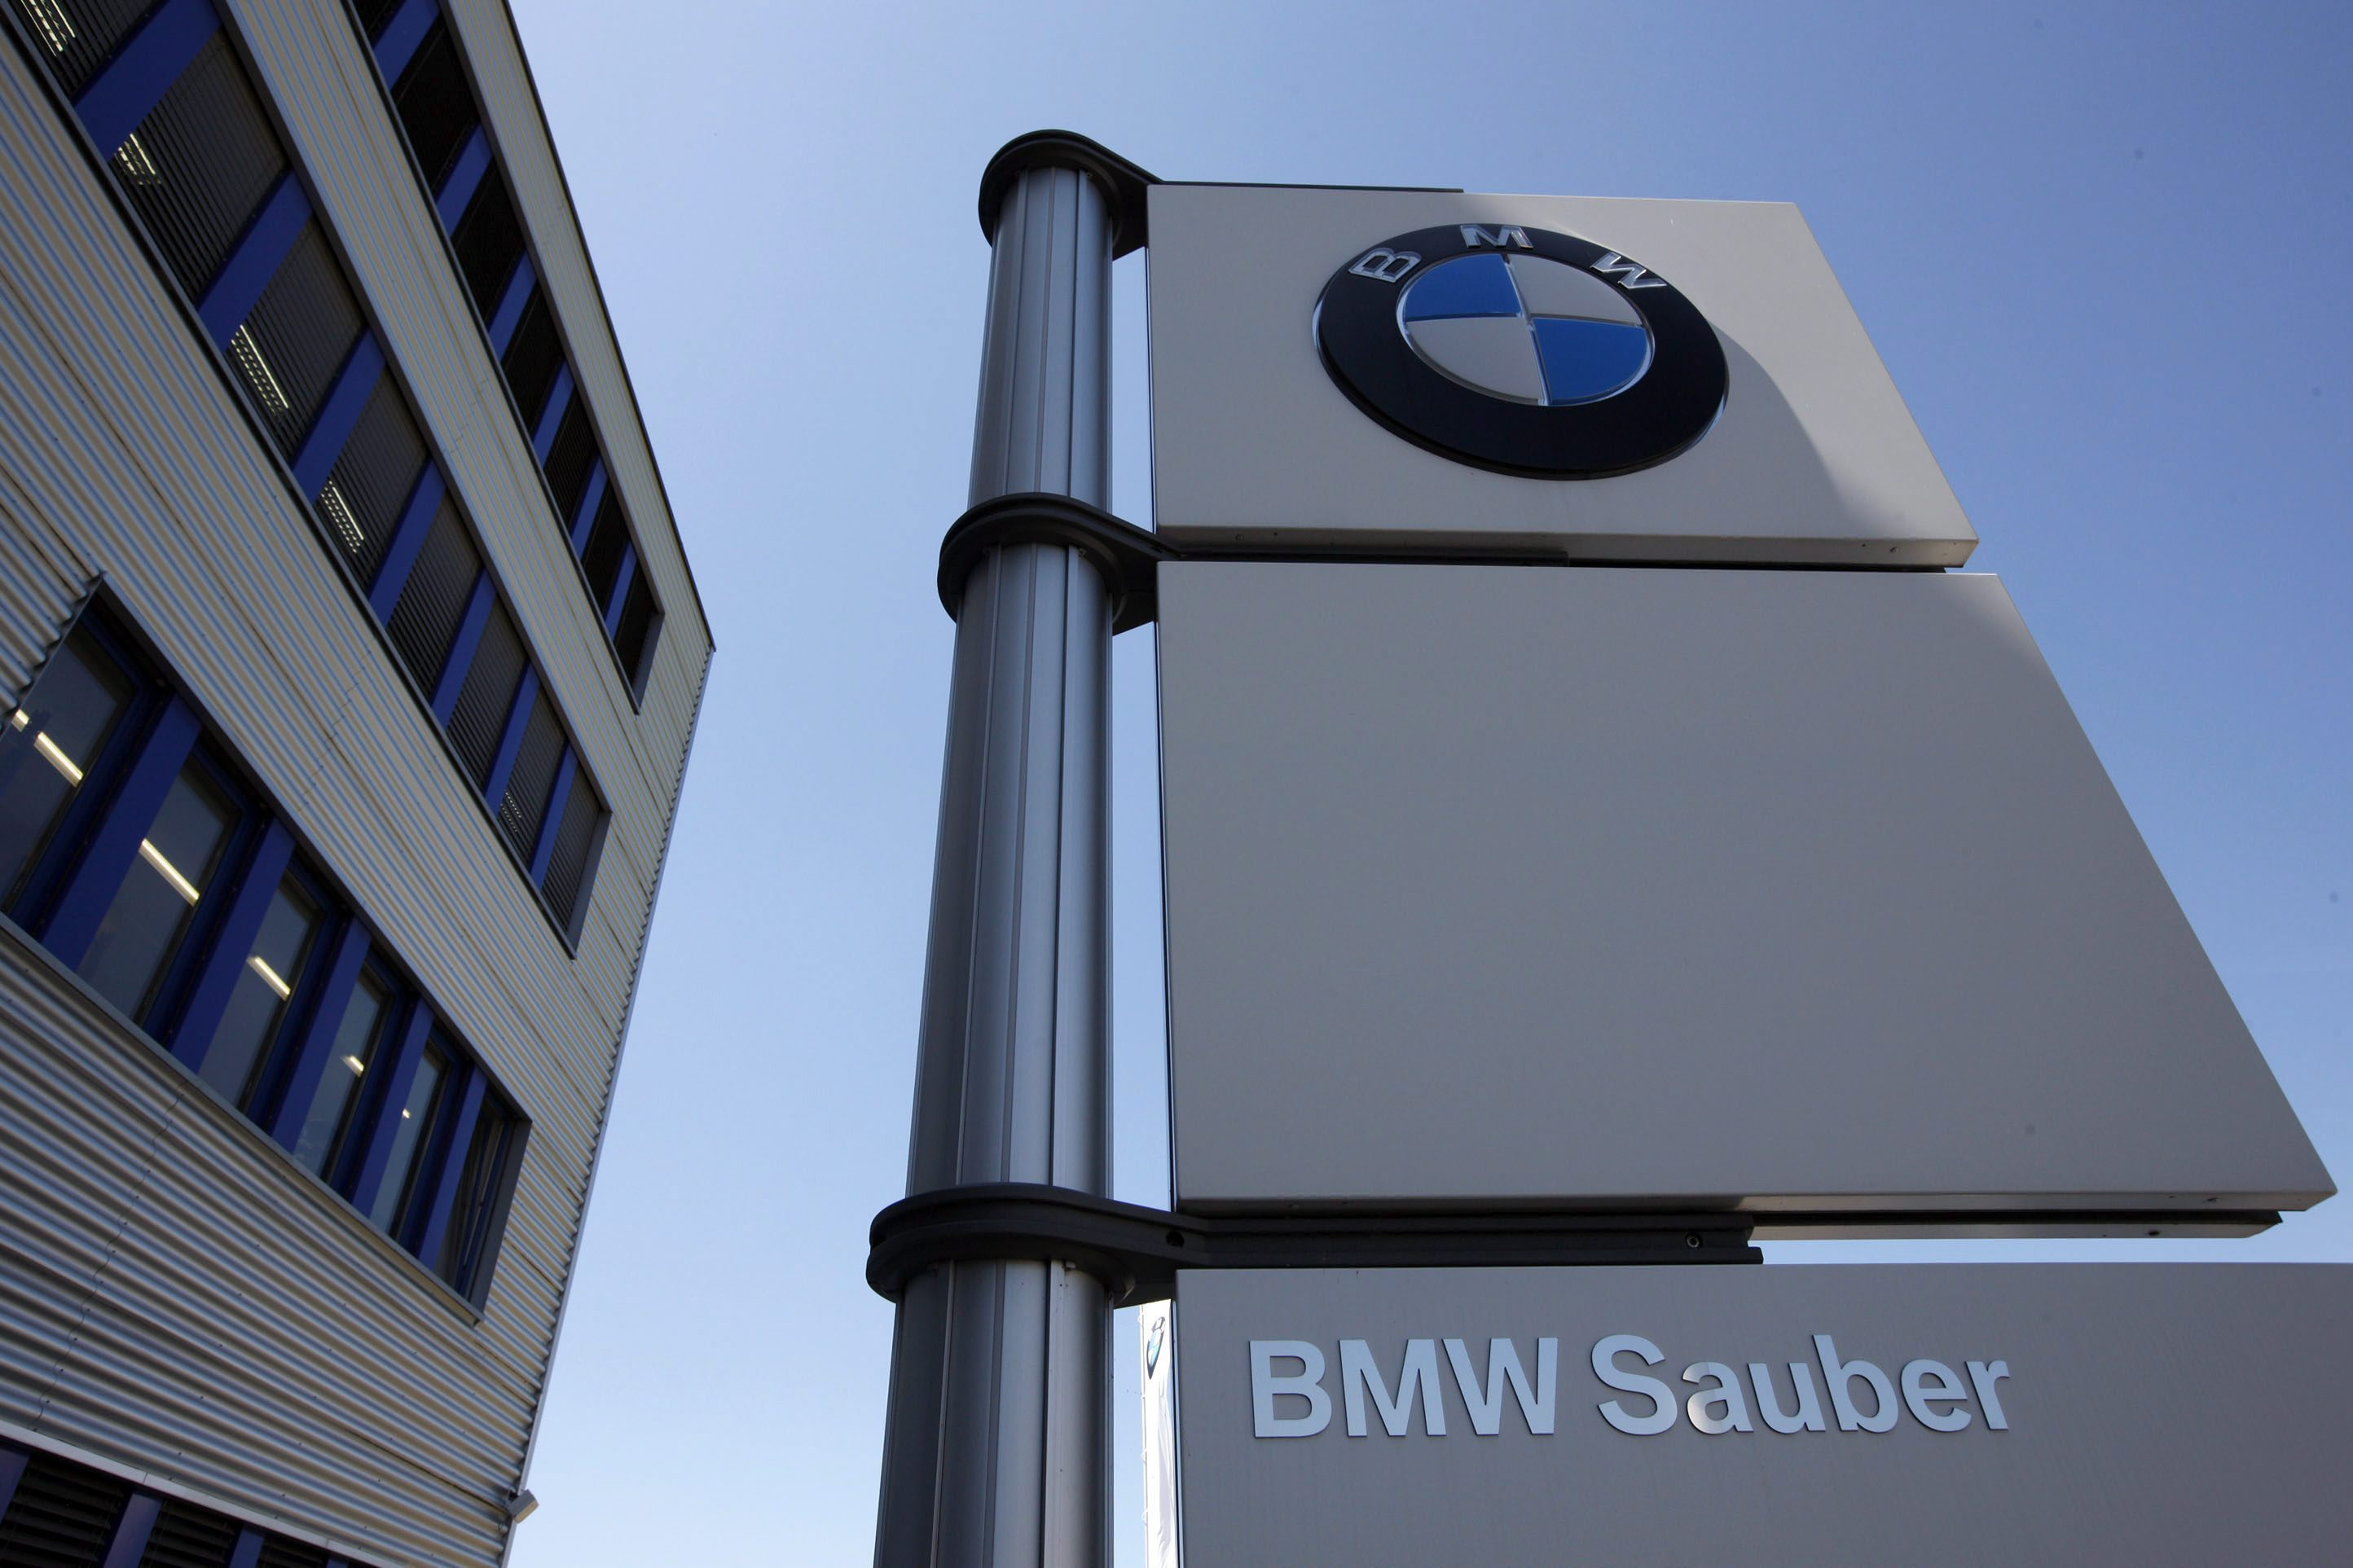 BMW invirtió 800 millones de euros en 2012 en compras en España